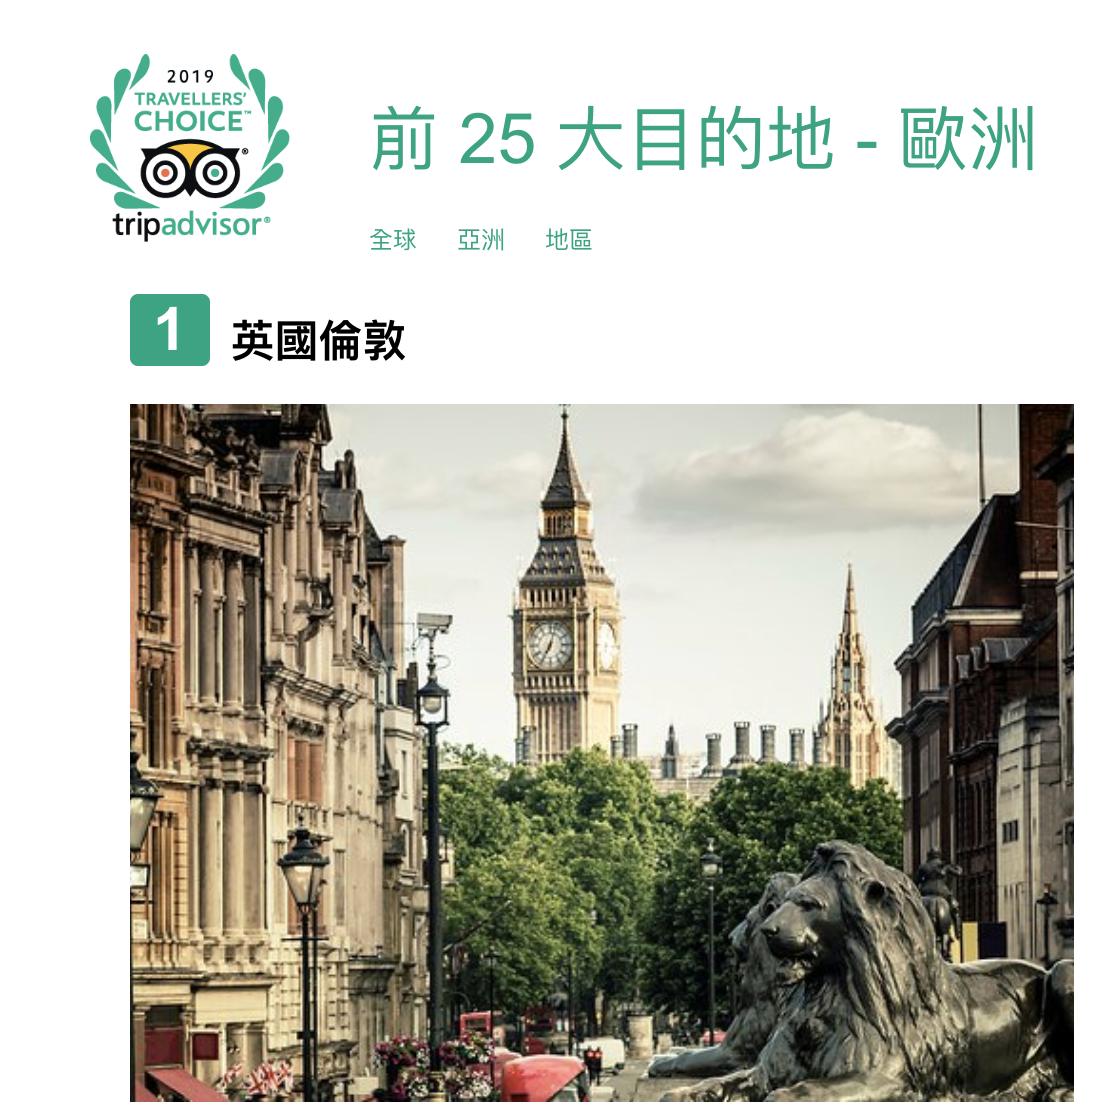 2019 Tripadvisor統計歐洲前10名推薦旅行城市 @走走停停,小燈泡在旅行